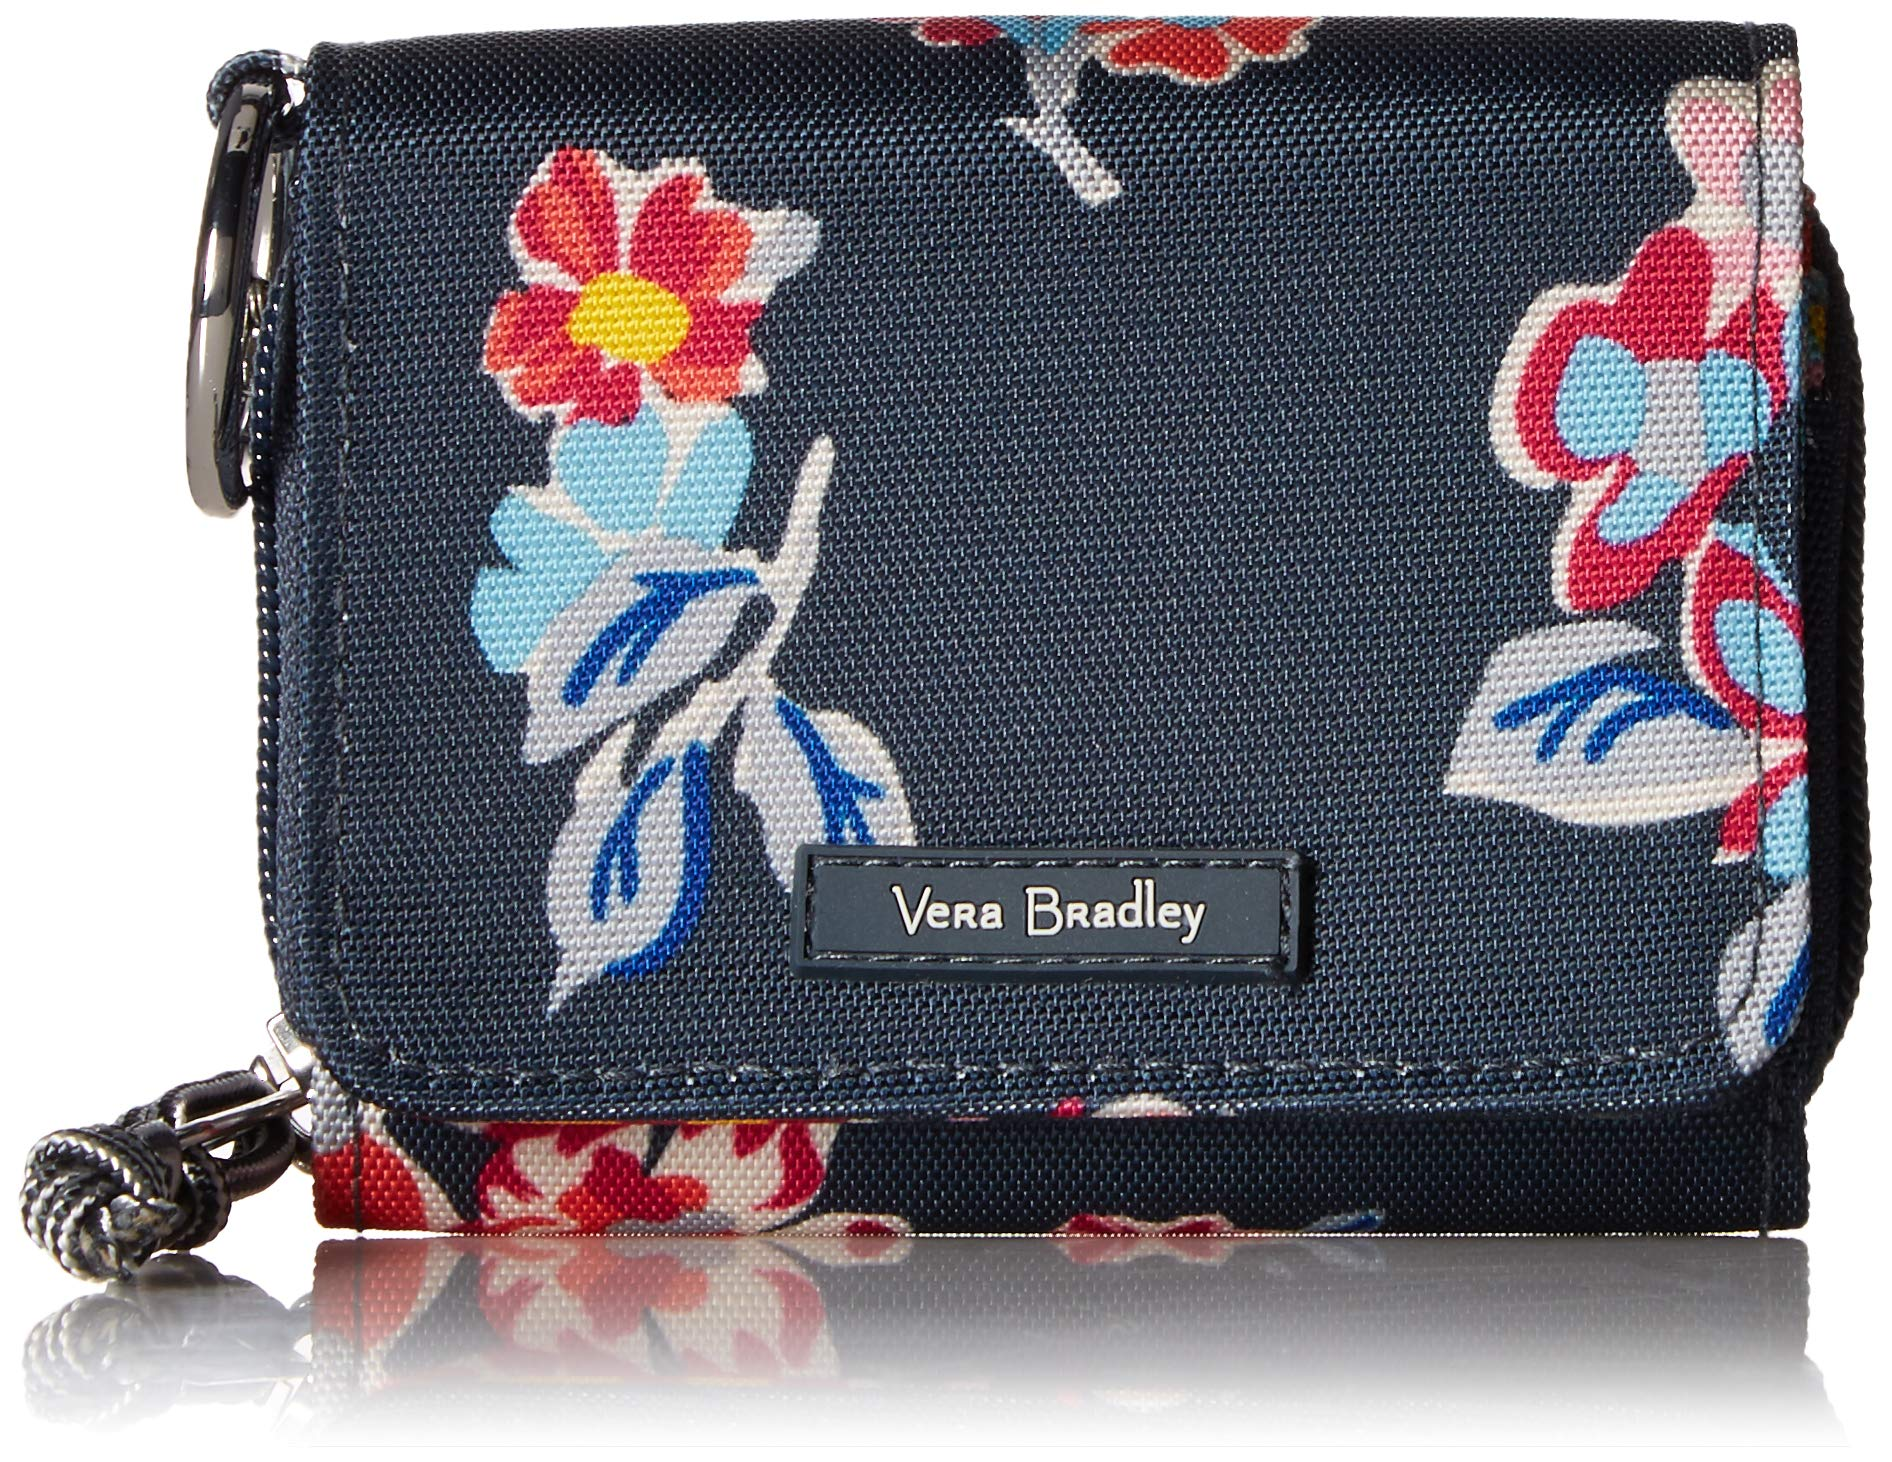 Vera Bradley Lighten Up RFID Card Case, Tossed Posies